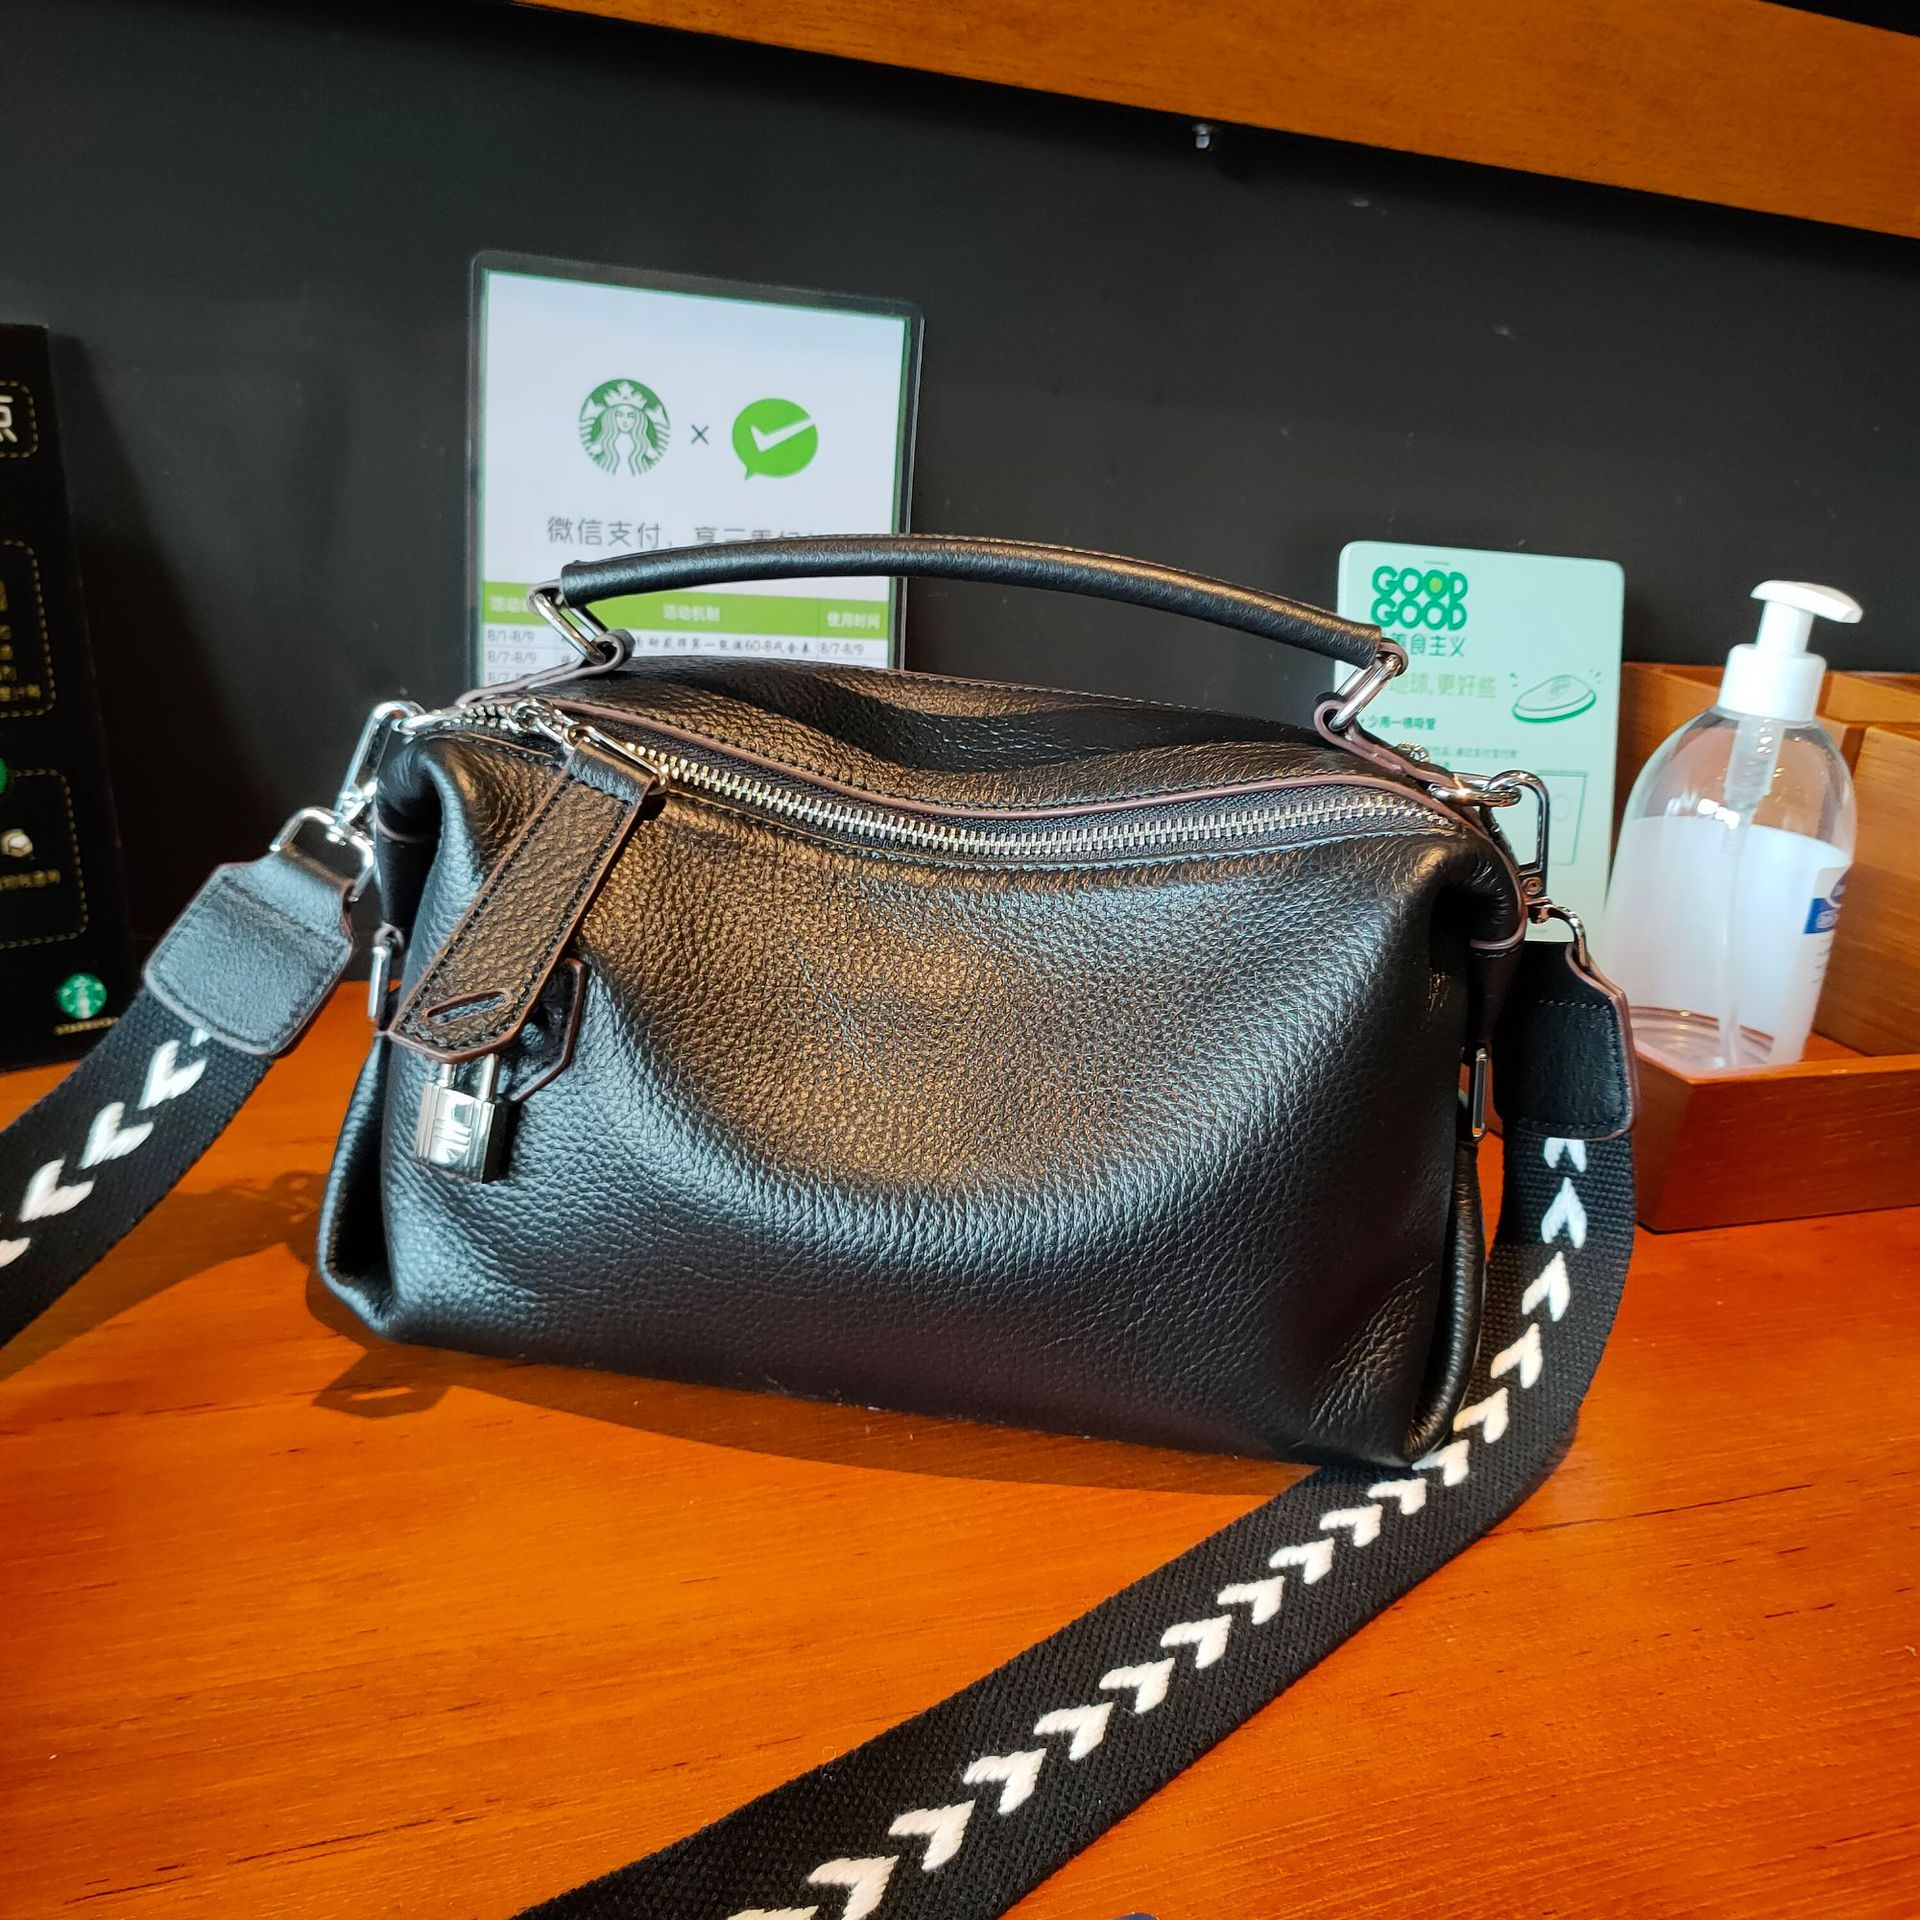 Fashion Soft Genuine Leather Handbag Business Women's Shoulder Messenger Bag Office Lady Top-handle Bag Small Totes Bags